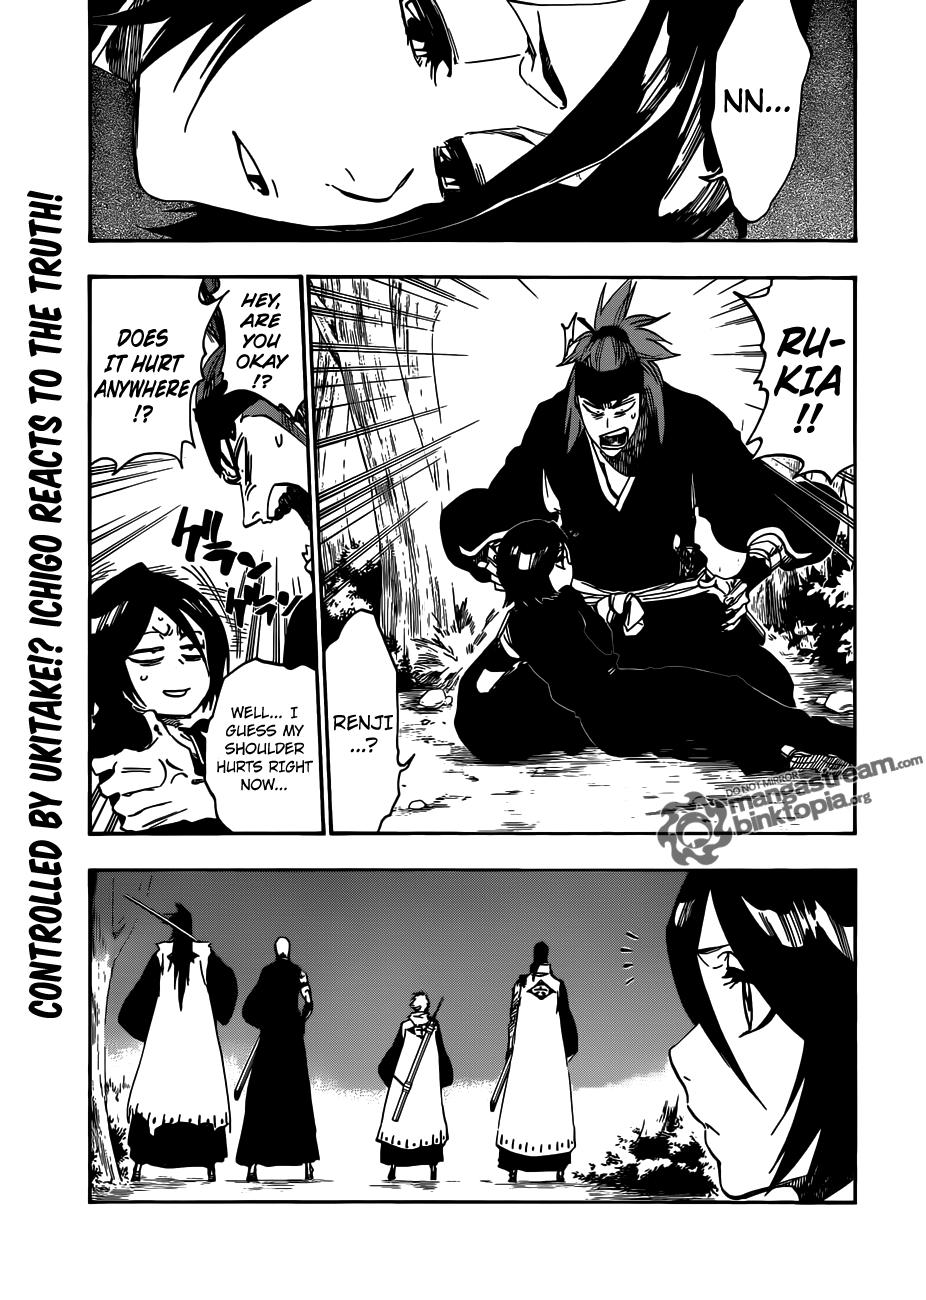 Bleach anime byakuya and rukia manga google search